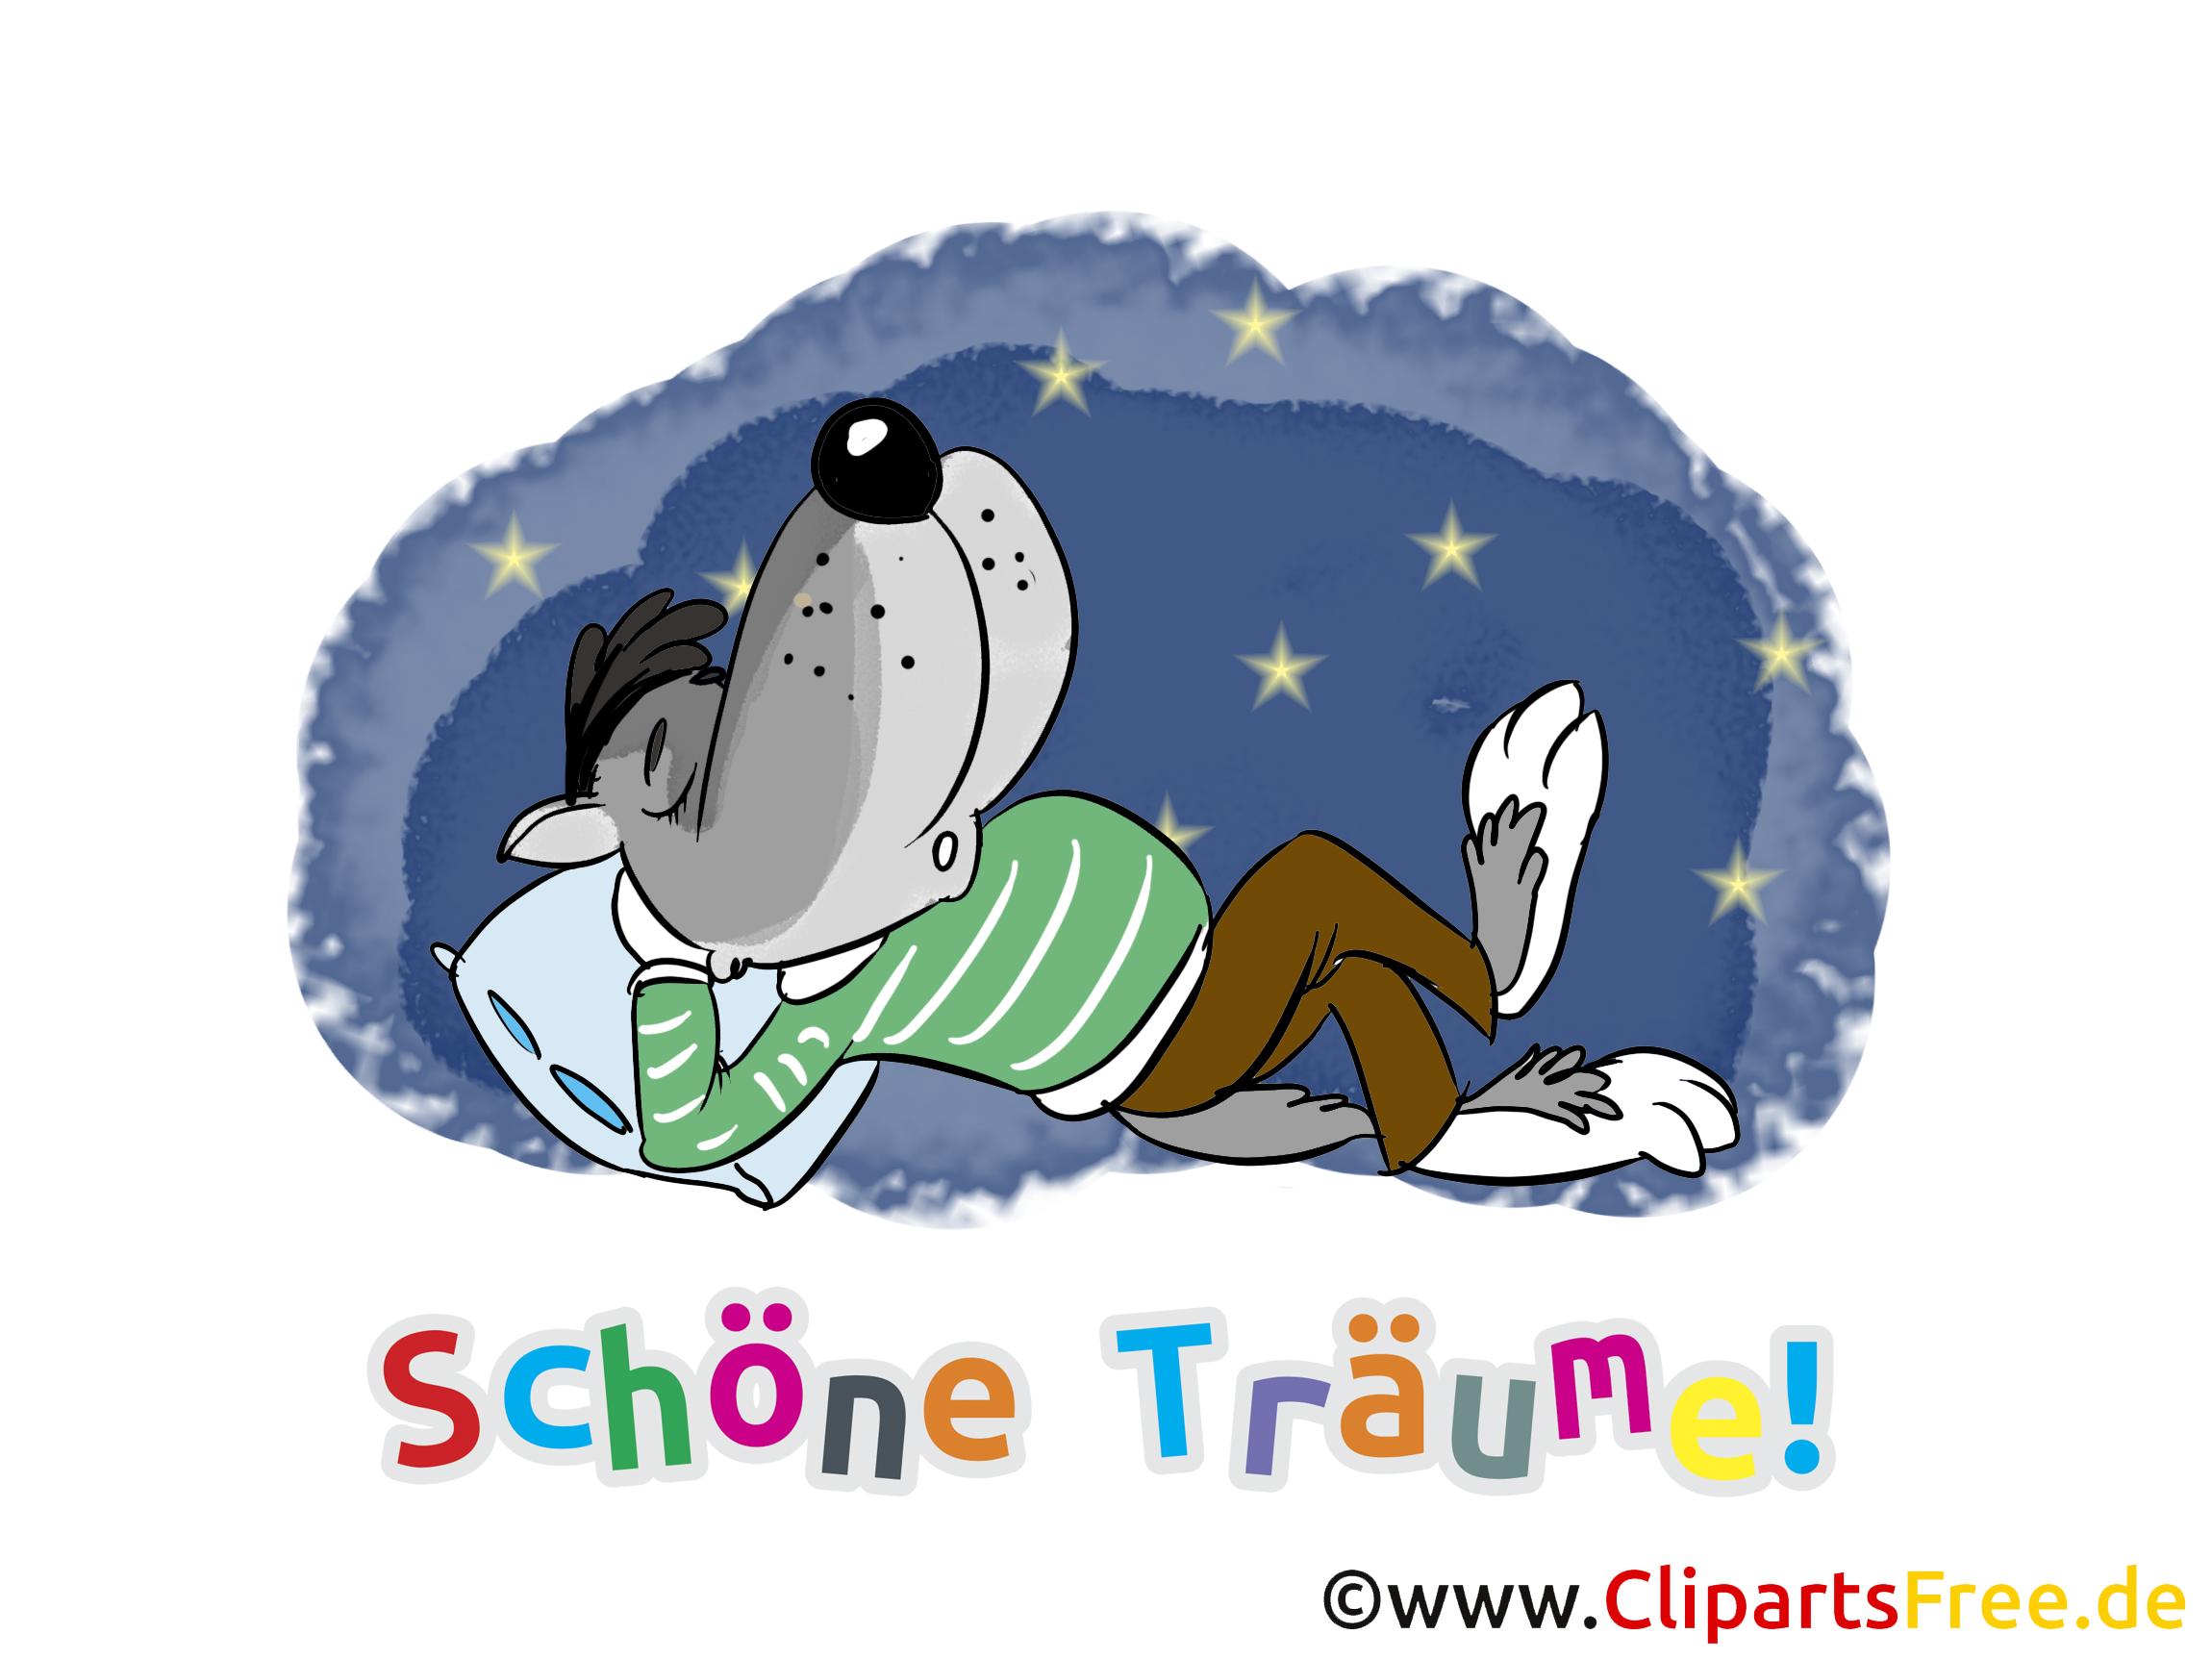 Gute freunde clipart clip royalty free Gute Nacht Bilder, Cliparts, Cartoons, Grafiken, Illustrationen ... clip royalty free